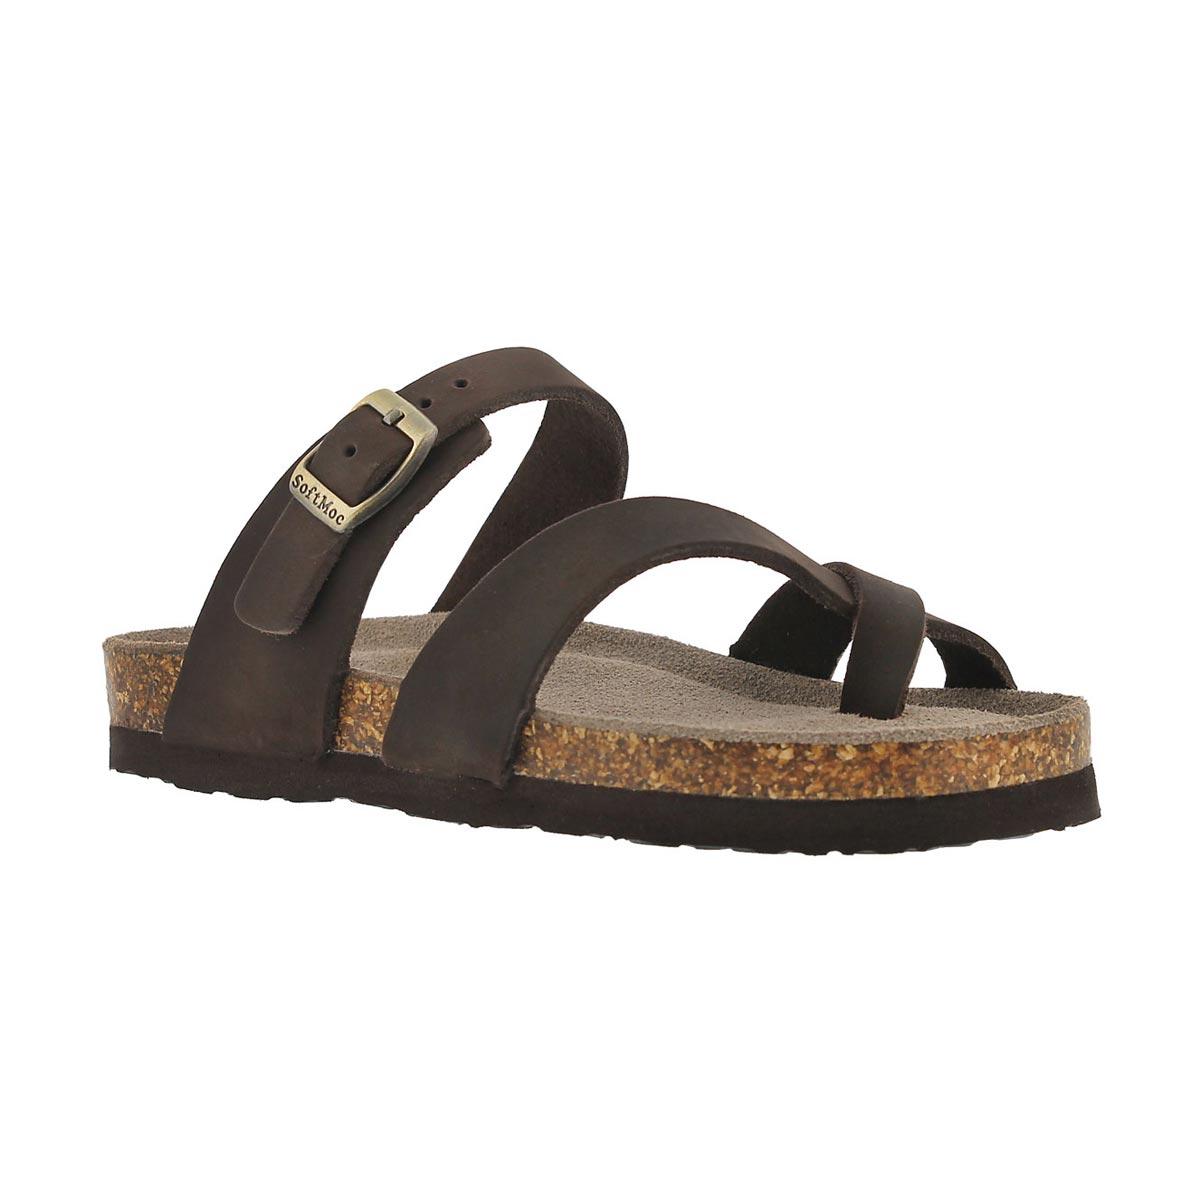 Girls' ALICIA brown leather toe loop sandals